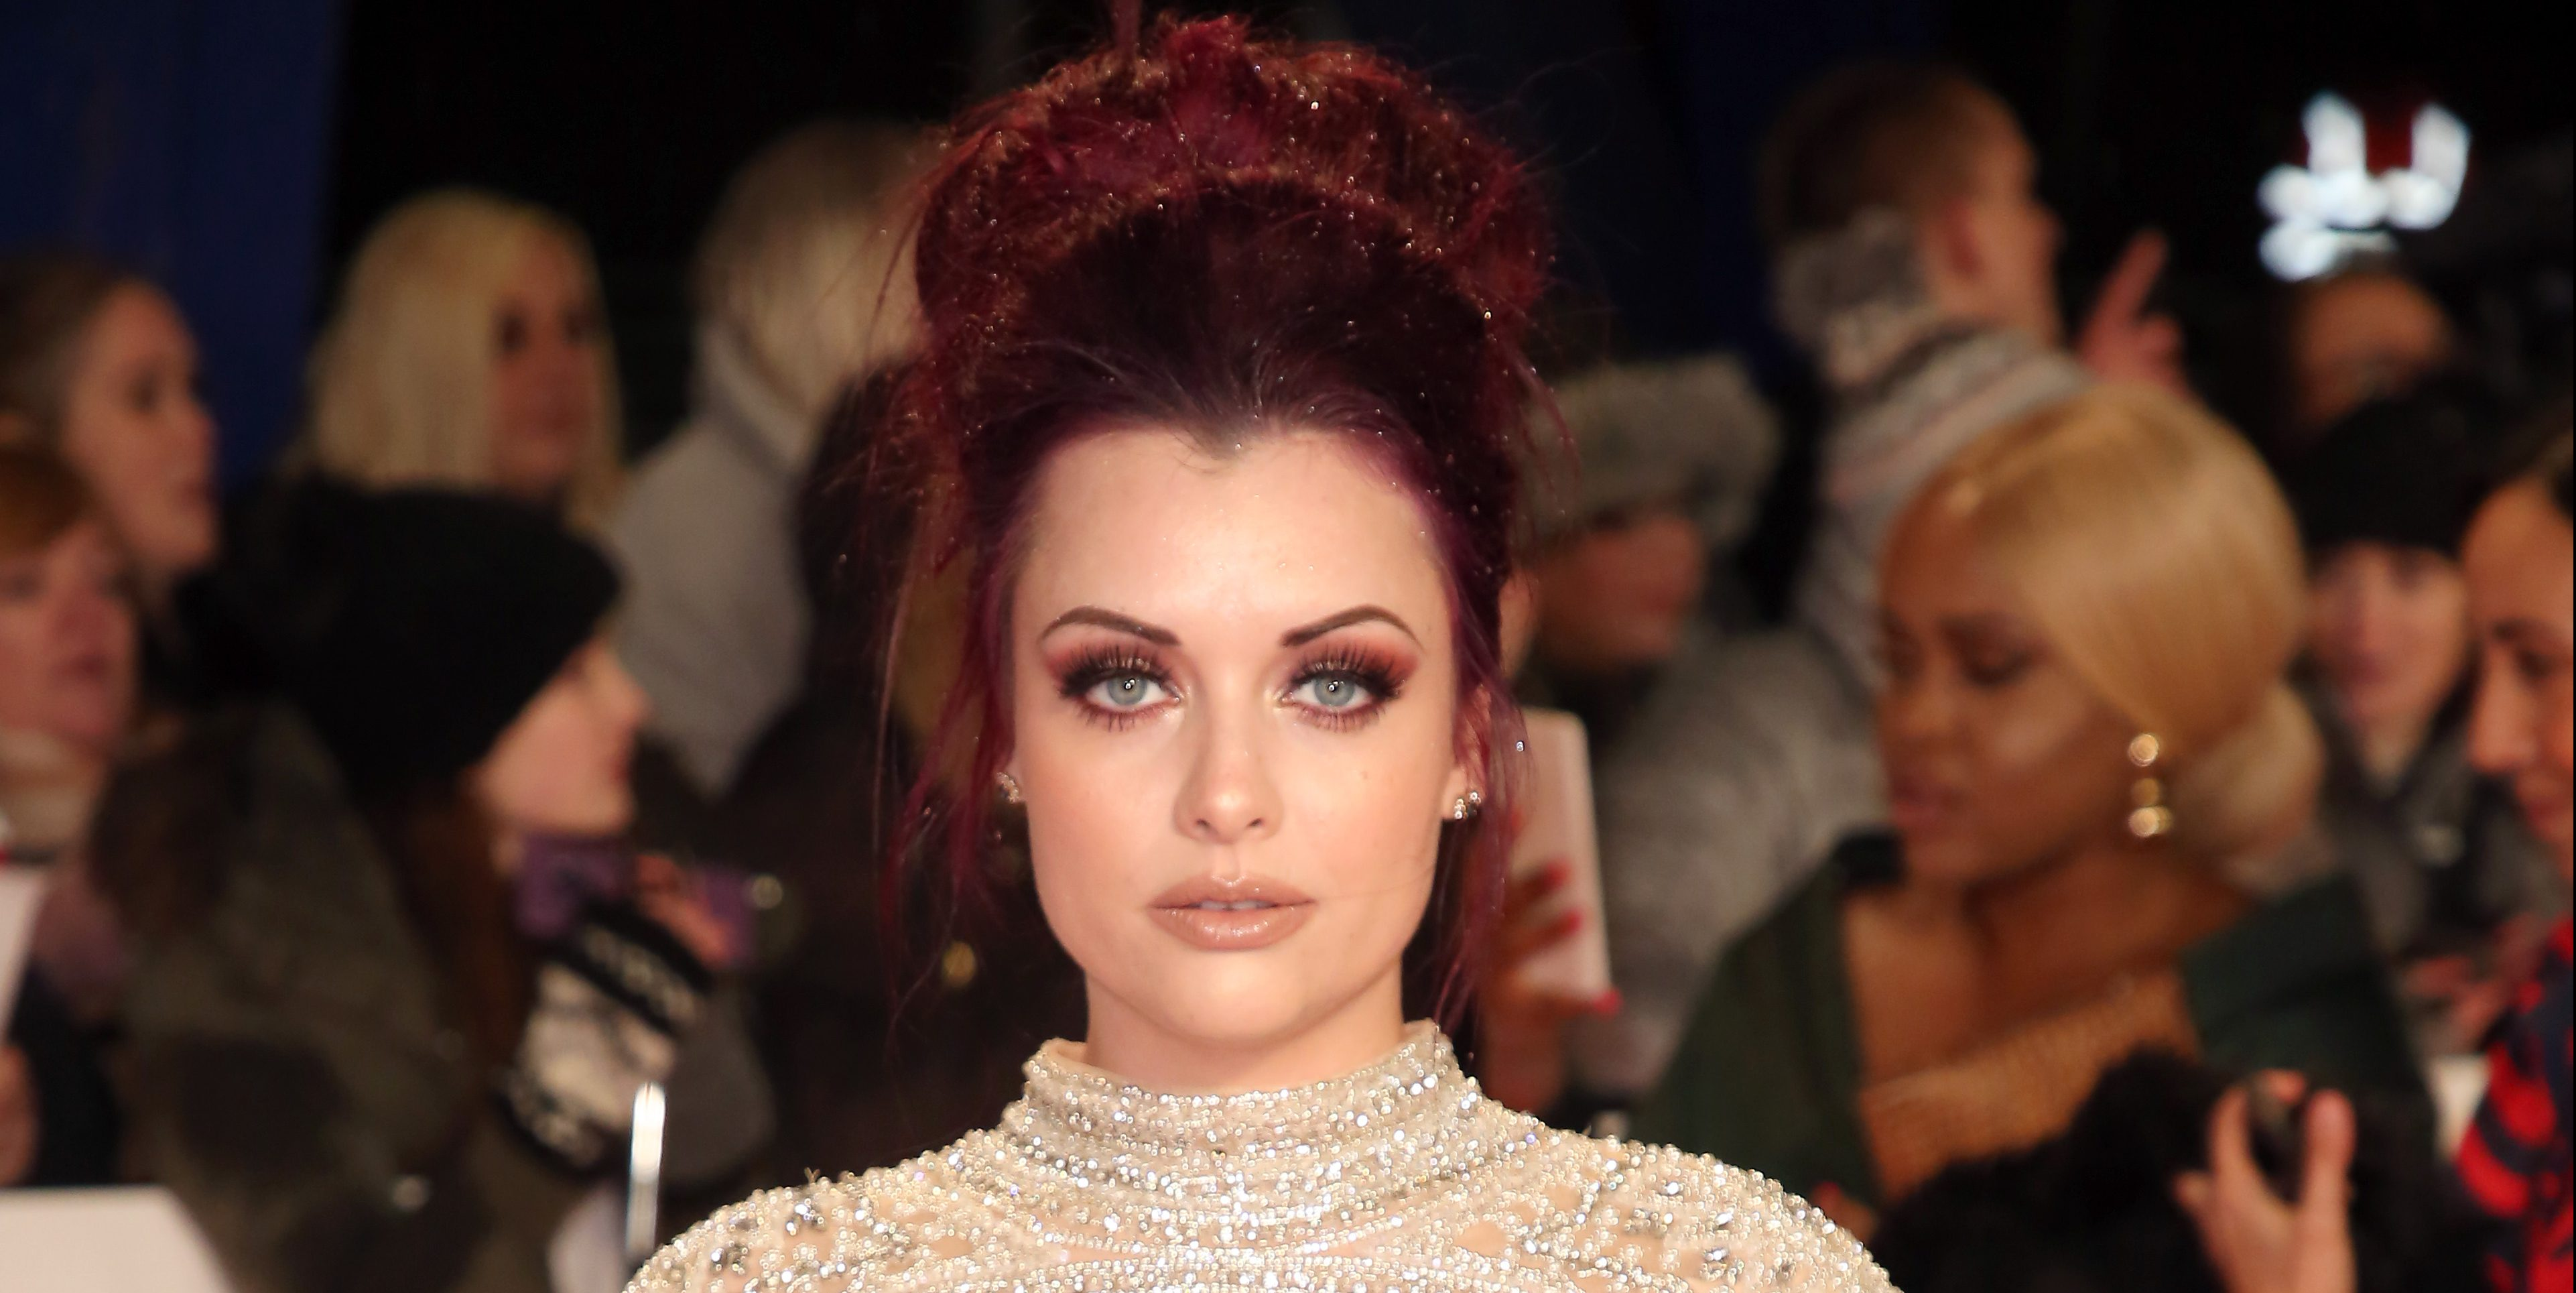 EastEnders' Shona McGarty splits from fiancé Ryan Harris